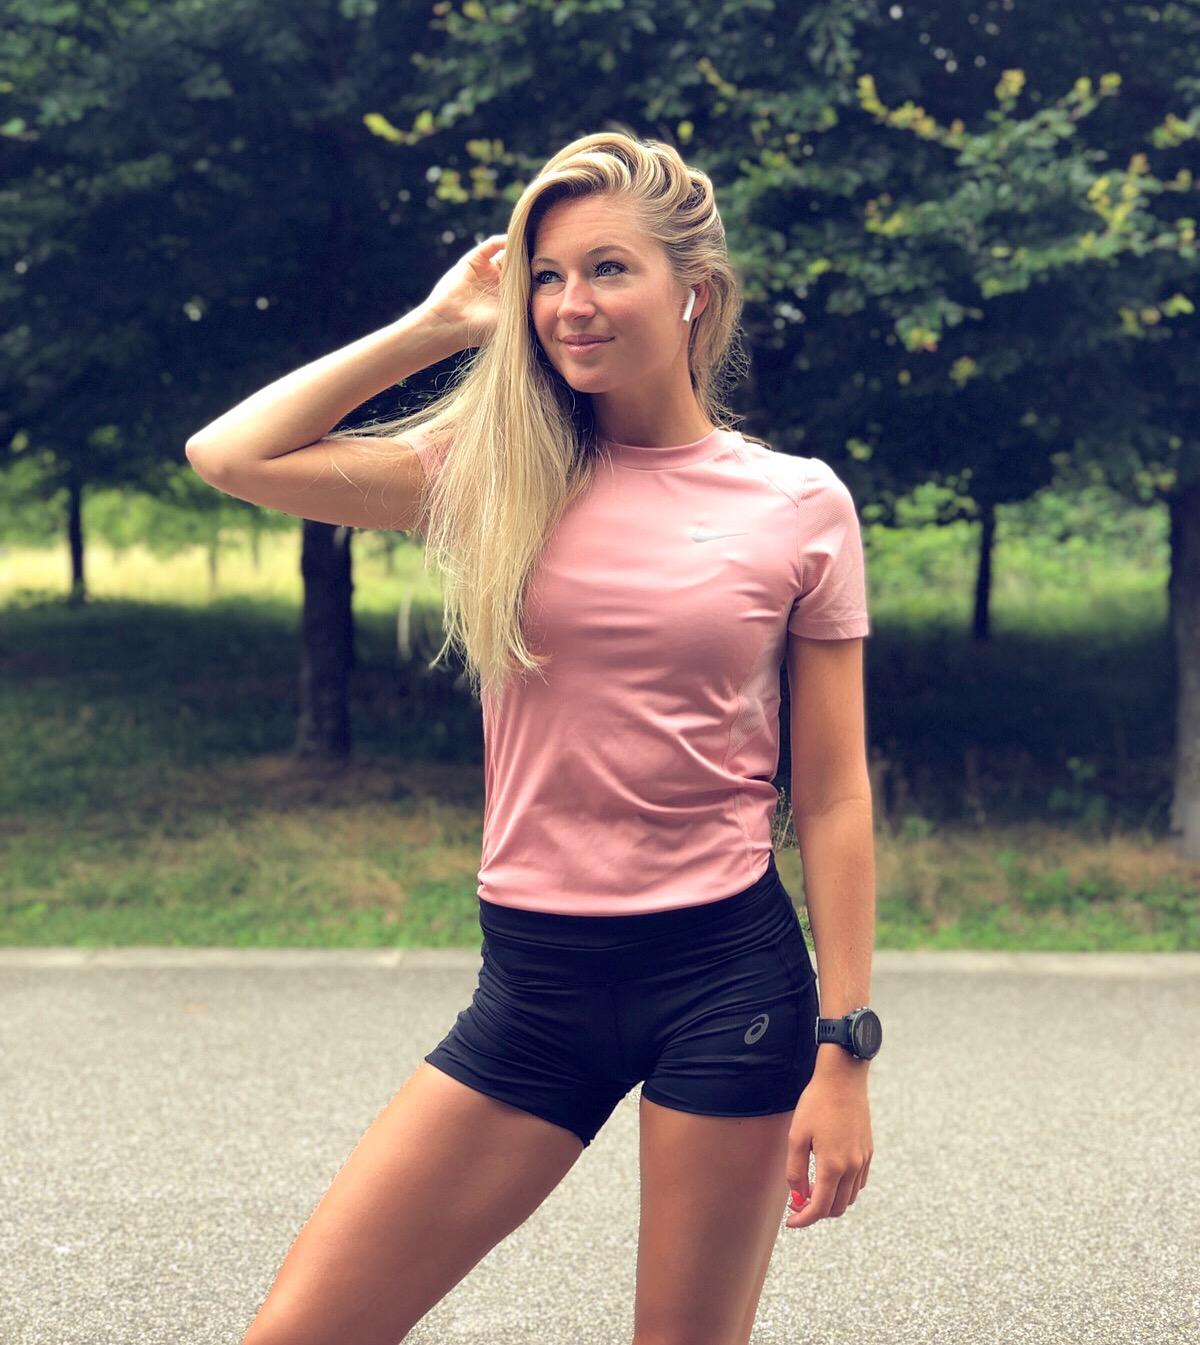 Hoe combineer je hardlopen en wielrennen?